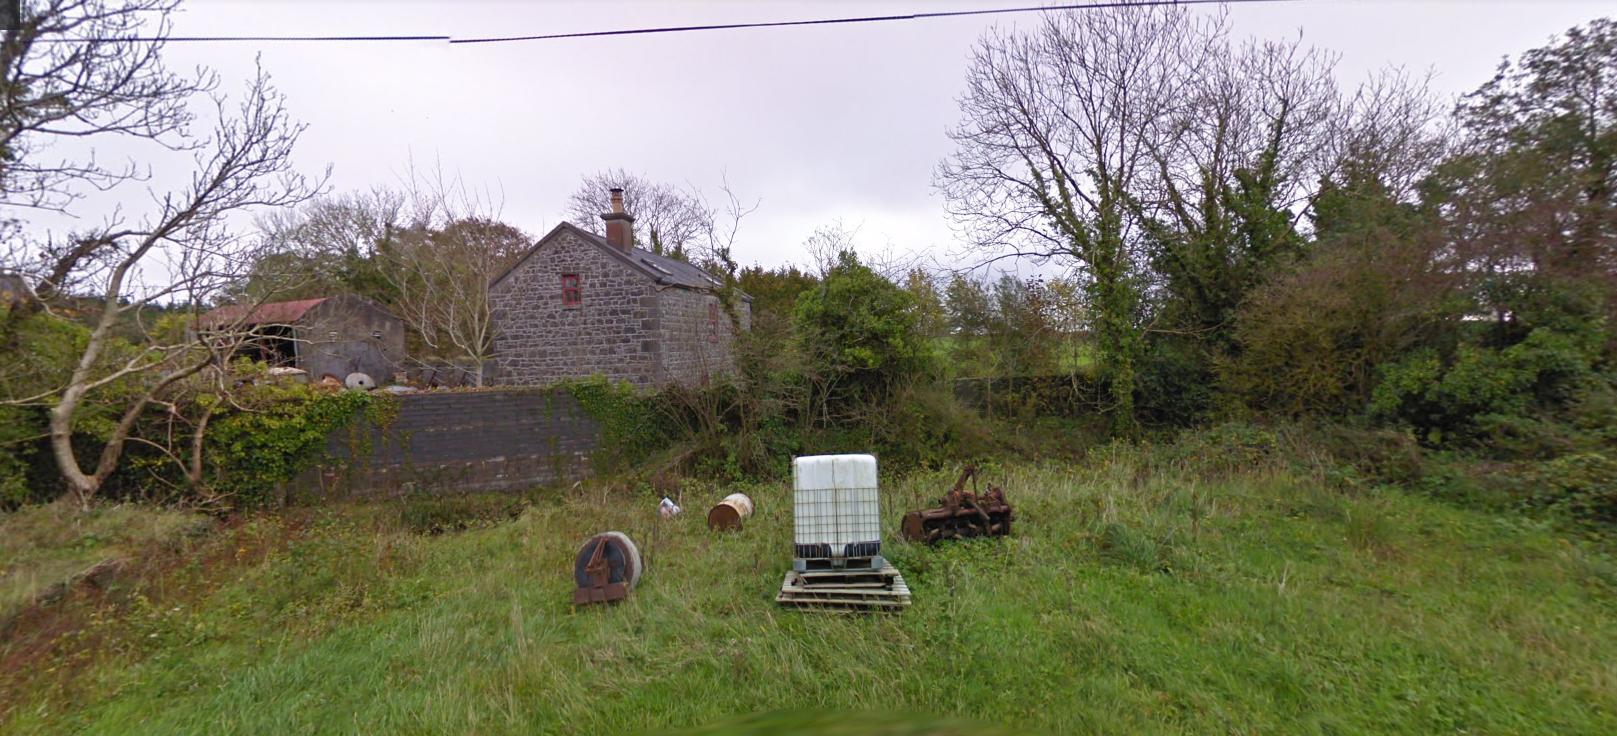 Milltown Mill in Galway - Visit Galway